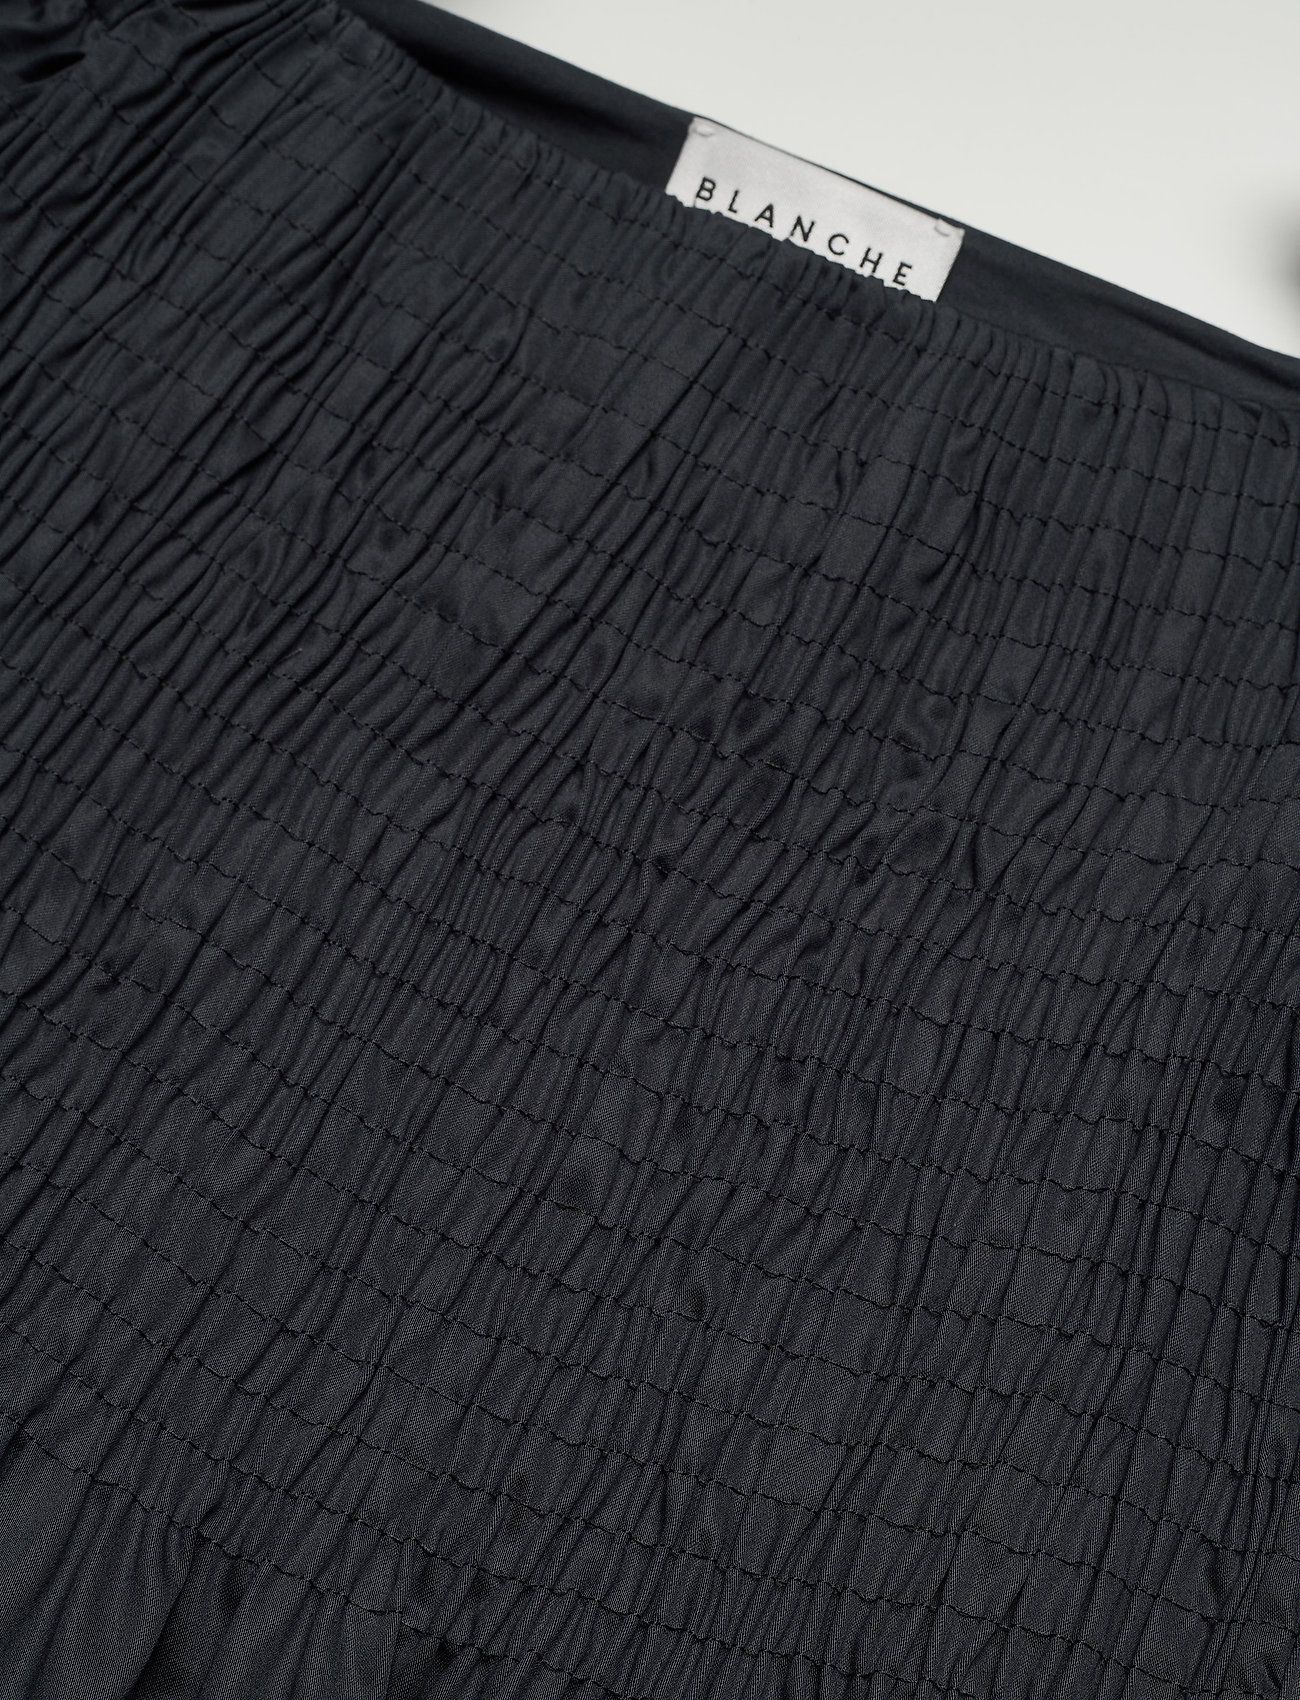 Ciola Smock Dress (Graphite) (191.40 €) - Blanche o1Htc